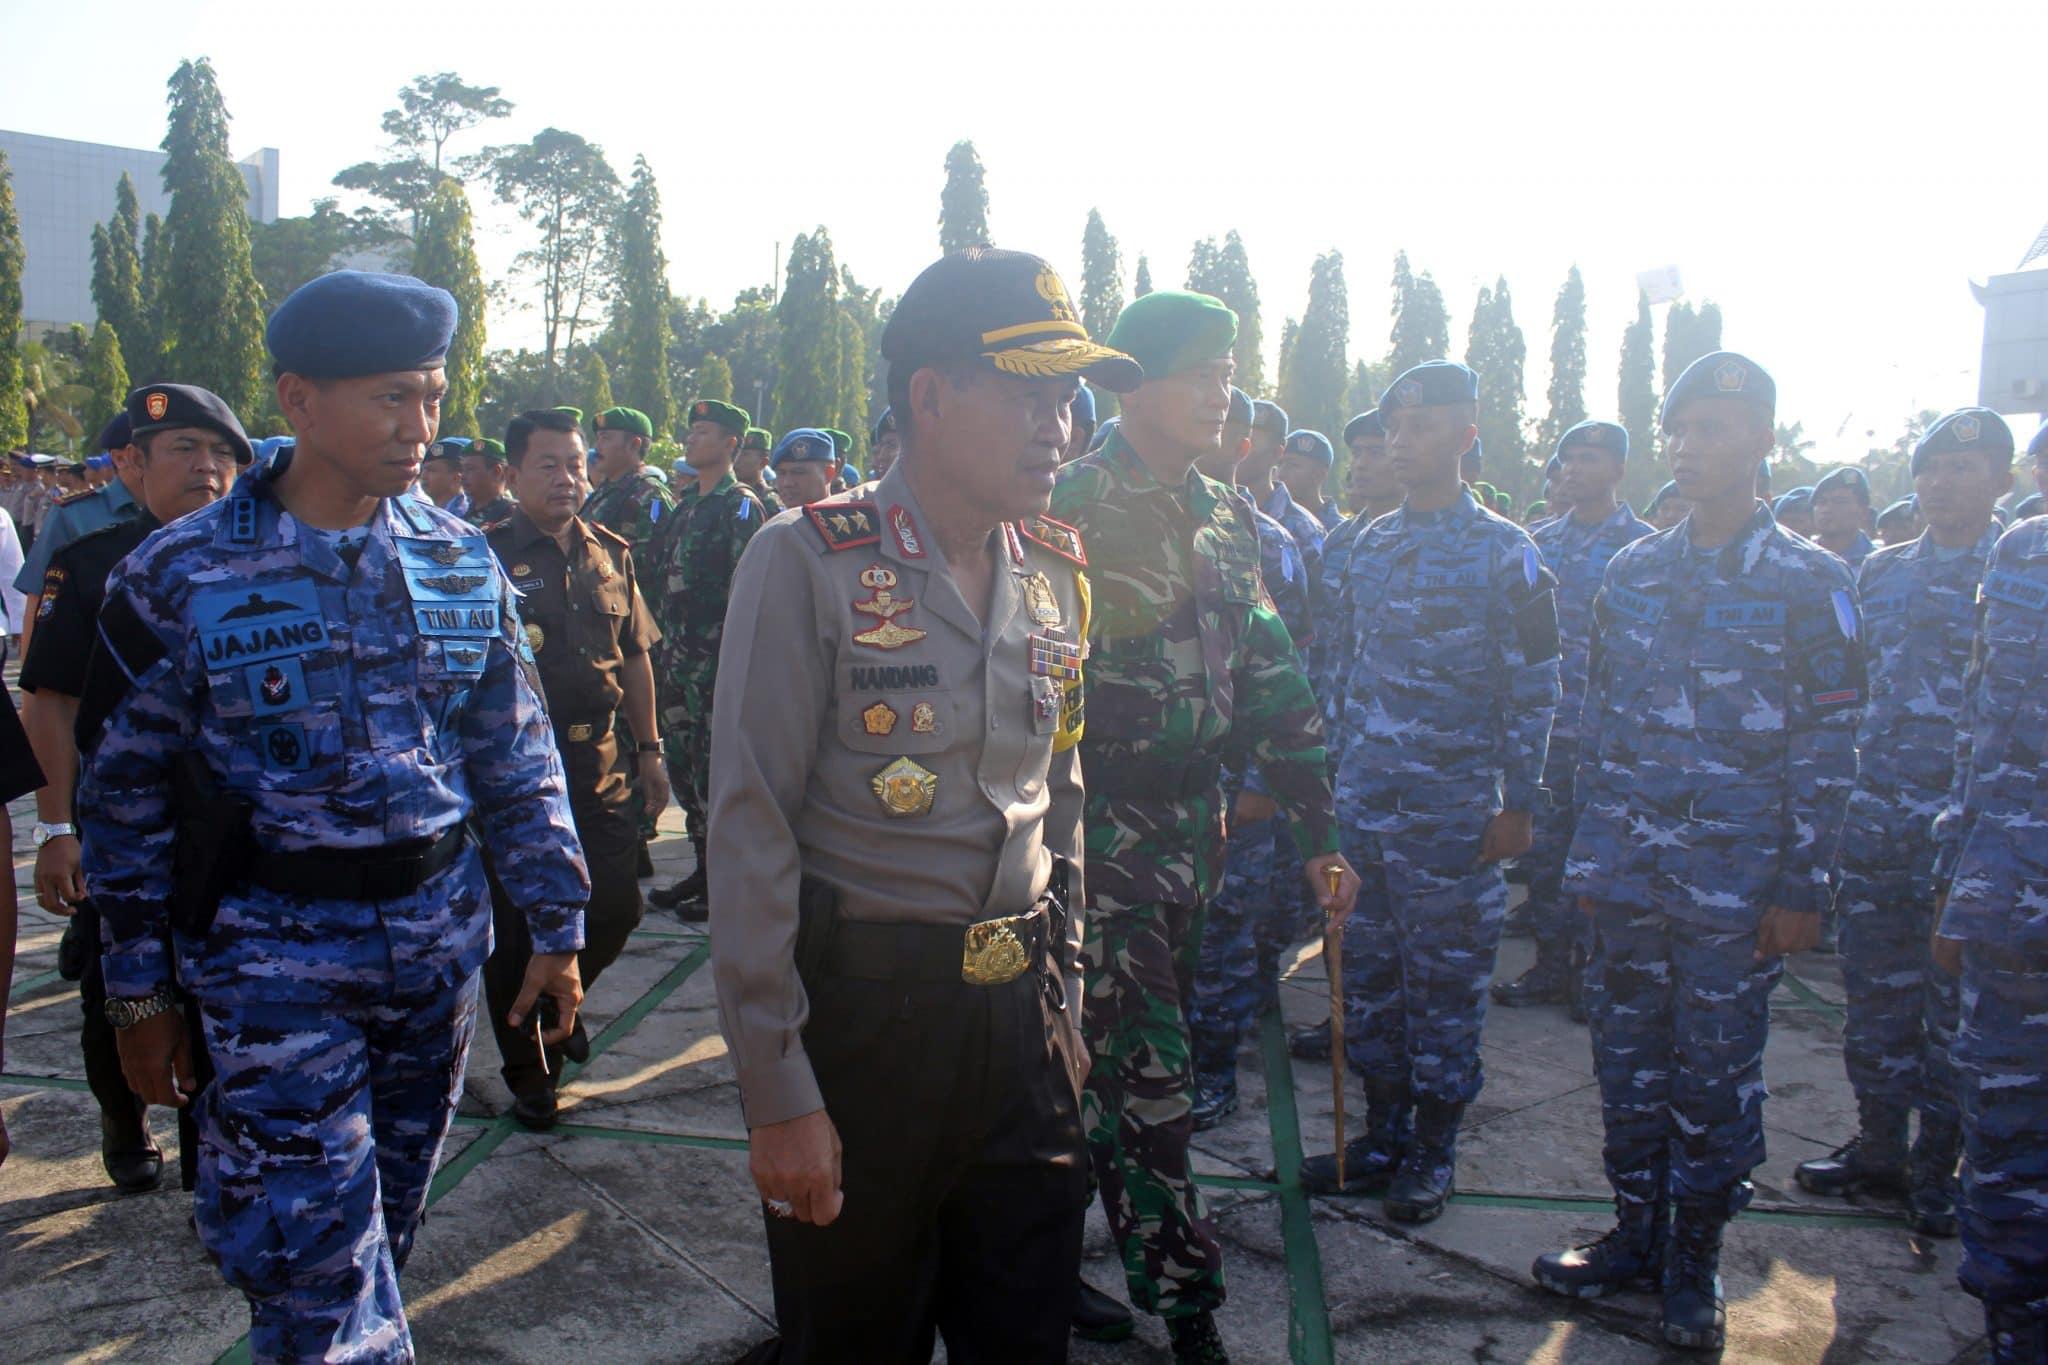 Personel Lanud Rsn Ikuti Apel Gelar Pasukan Pam Lebaran 2018